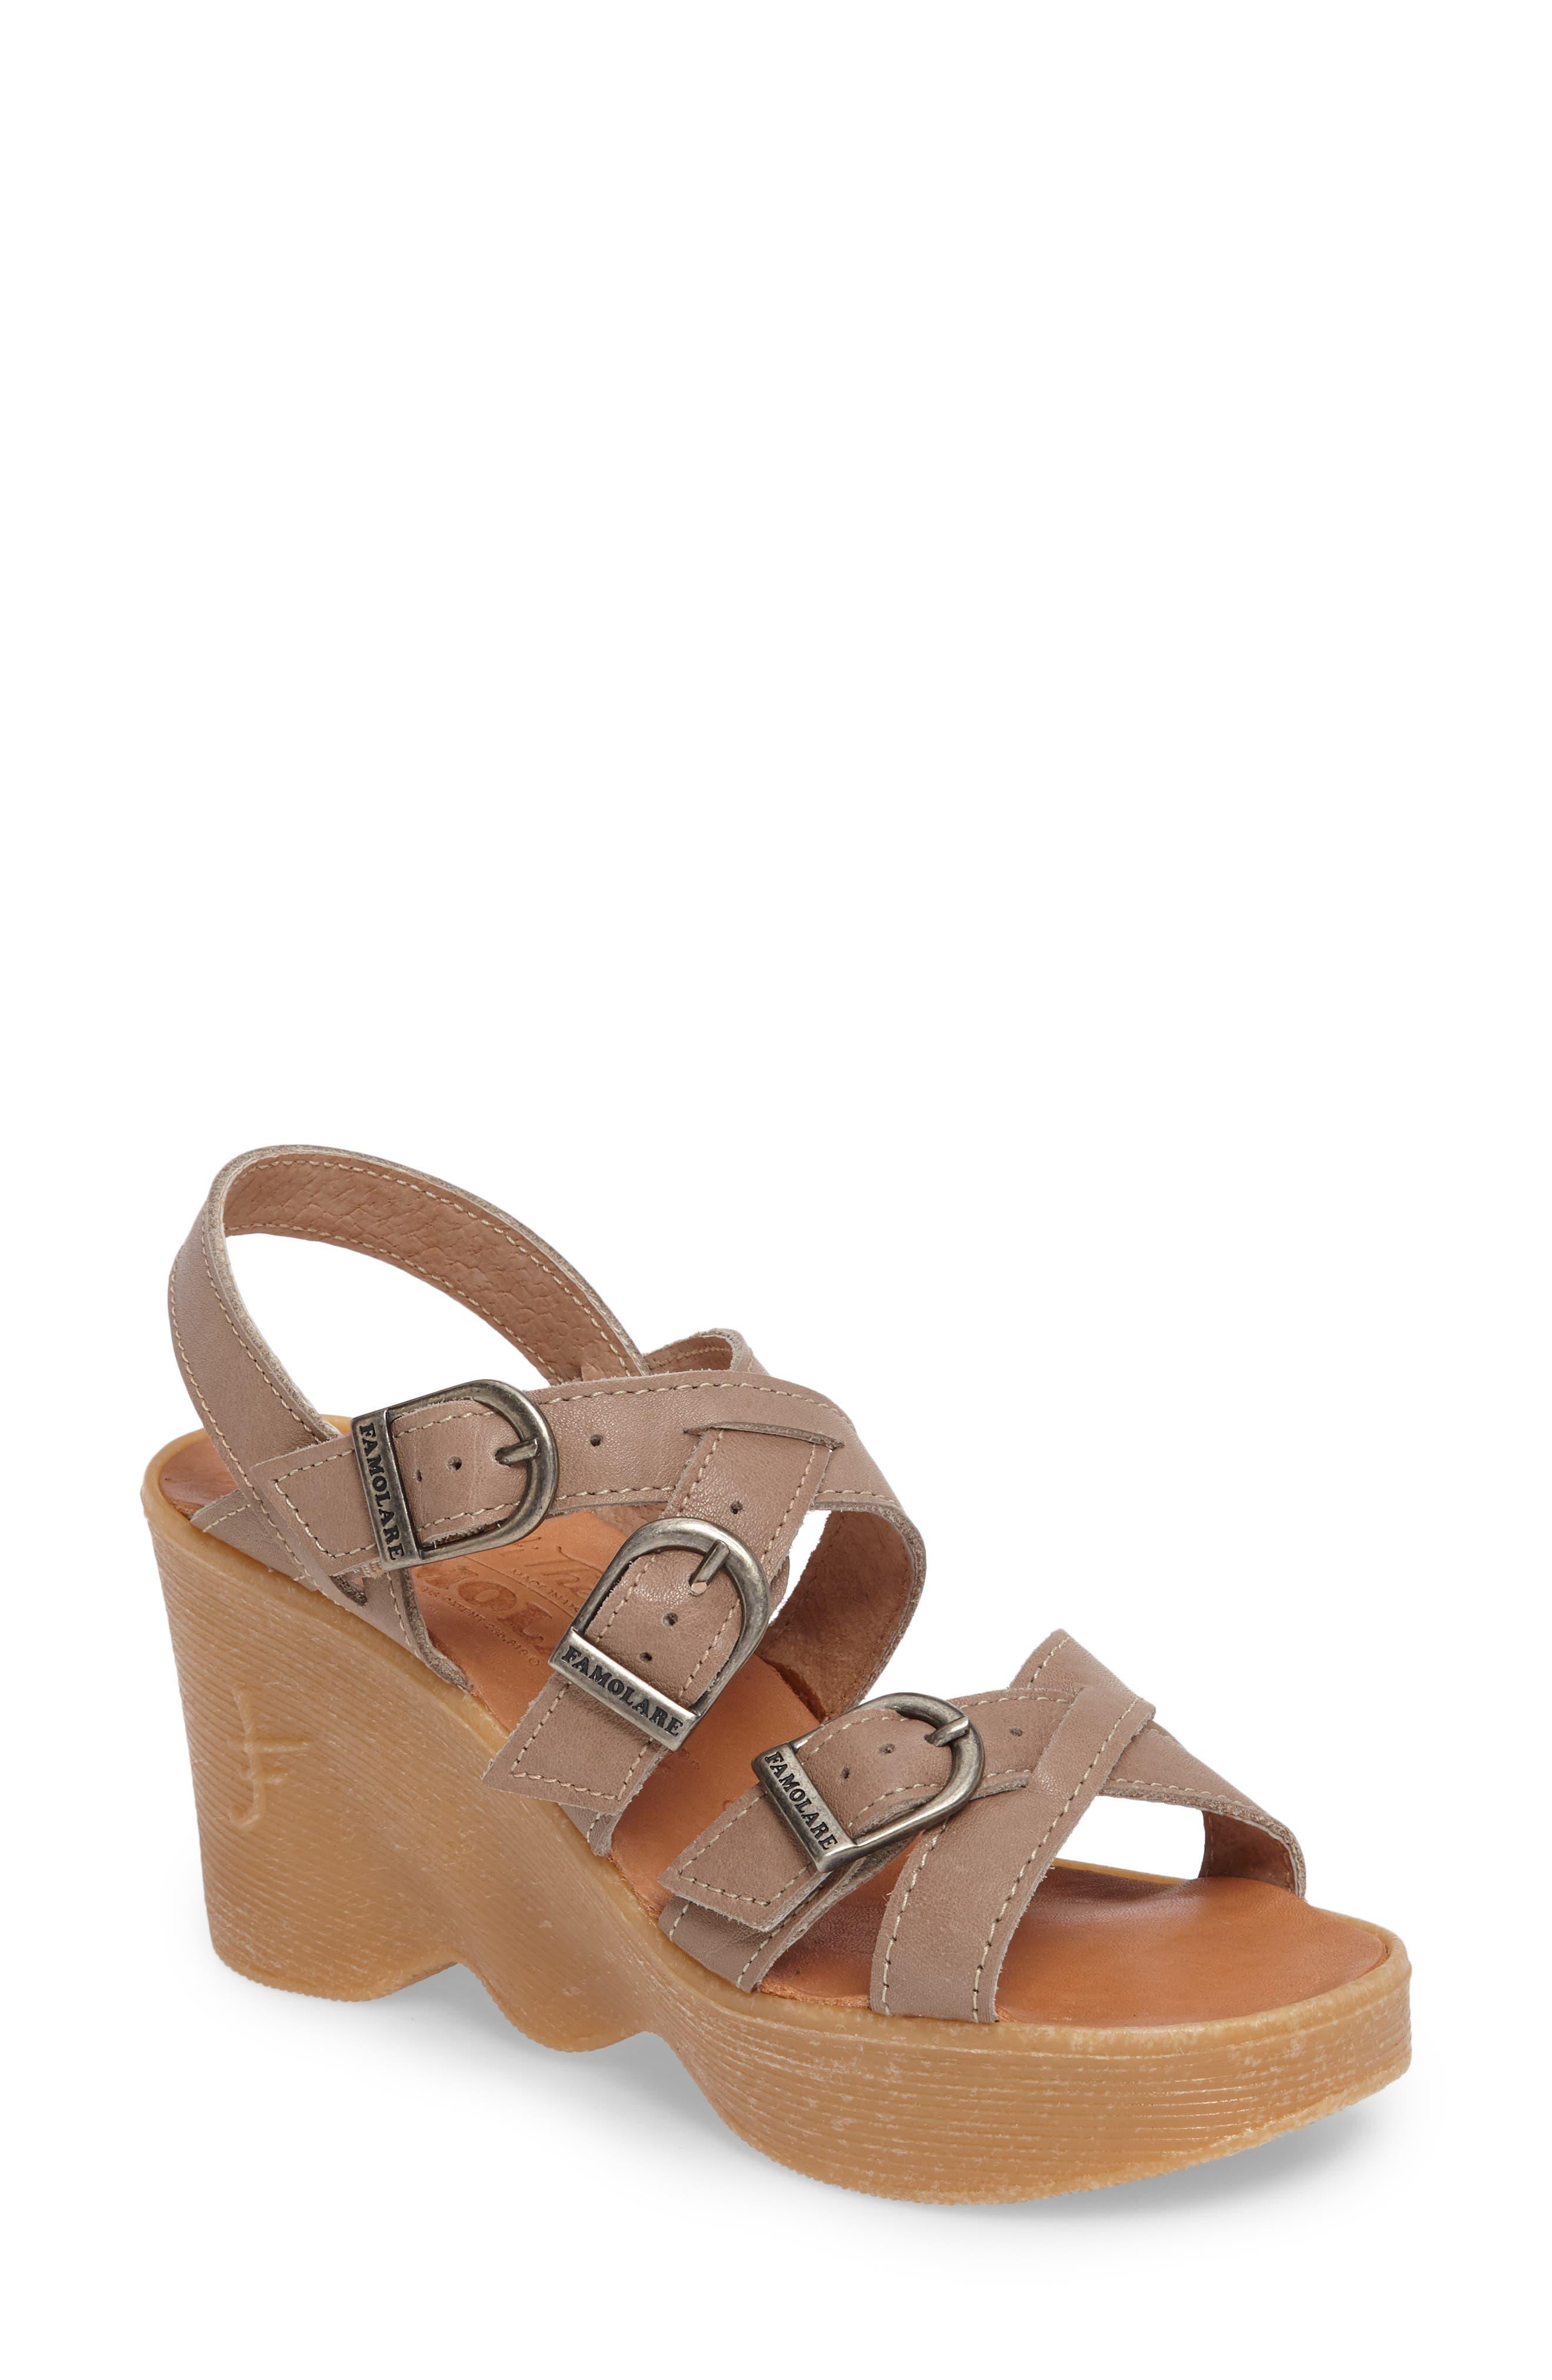 Alternate Image 1 Selected - Famolare Buckle Up Wedge Sandal (Women)